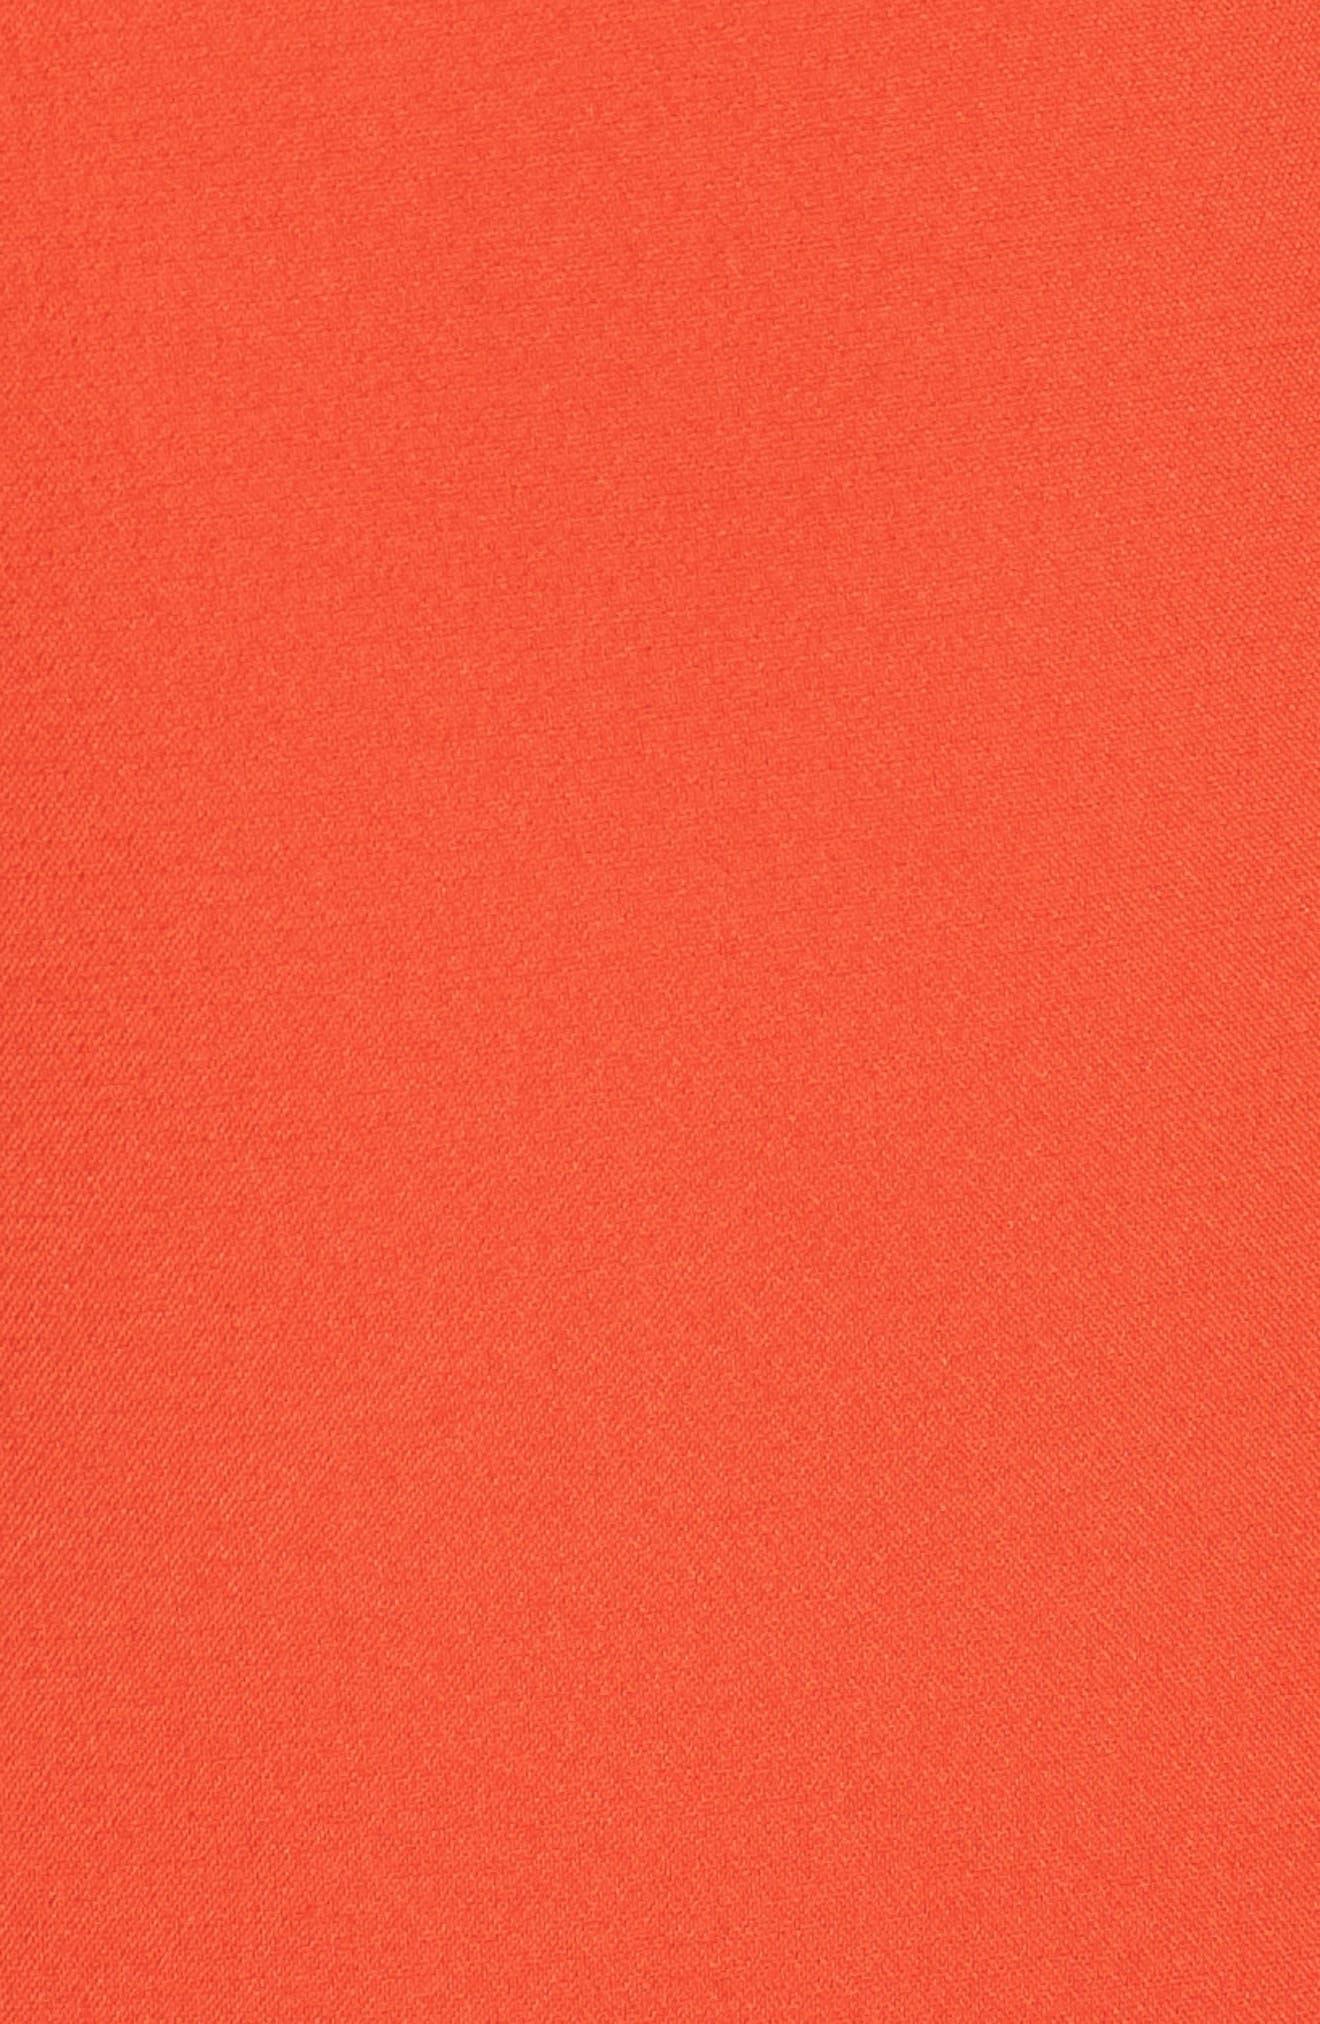 Ruffle Hem Minidress,                             Alternate thumbnail 6, color,                             TANGERINE